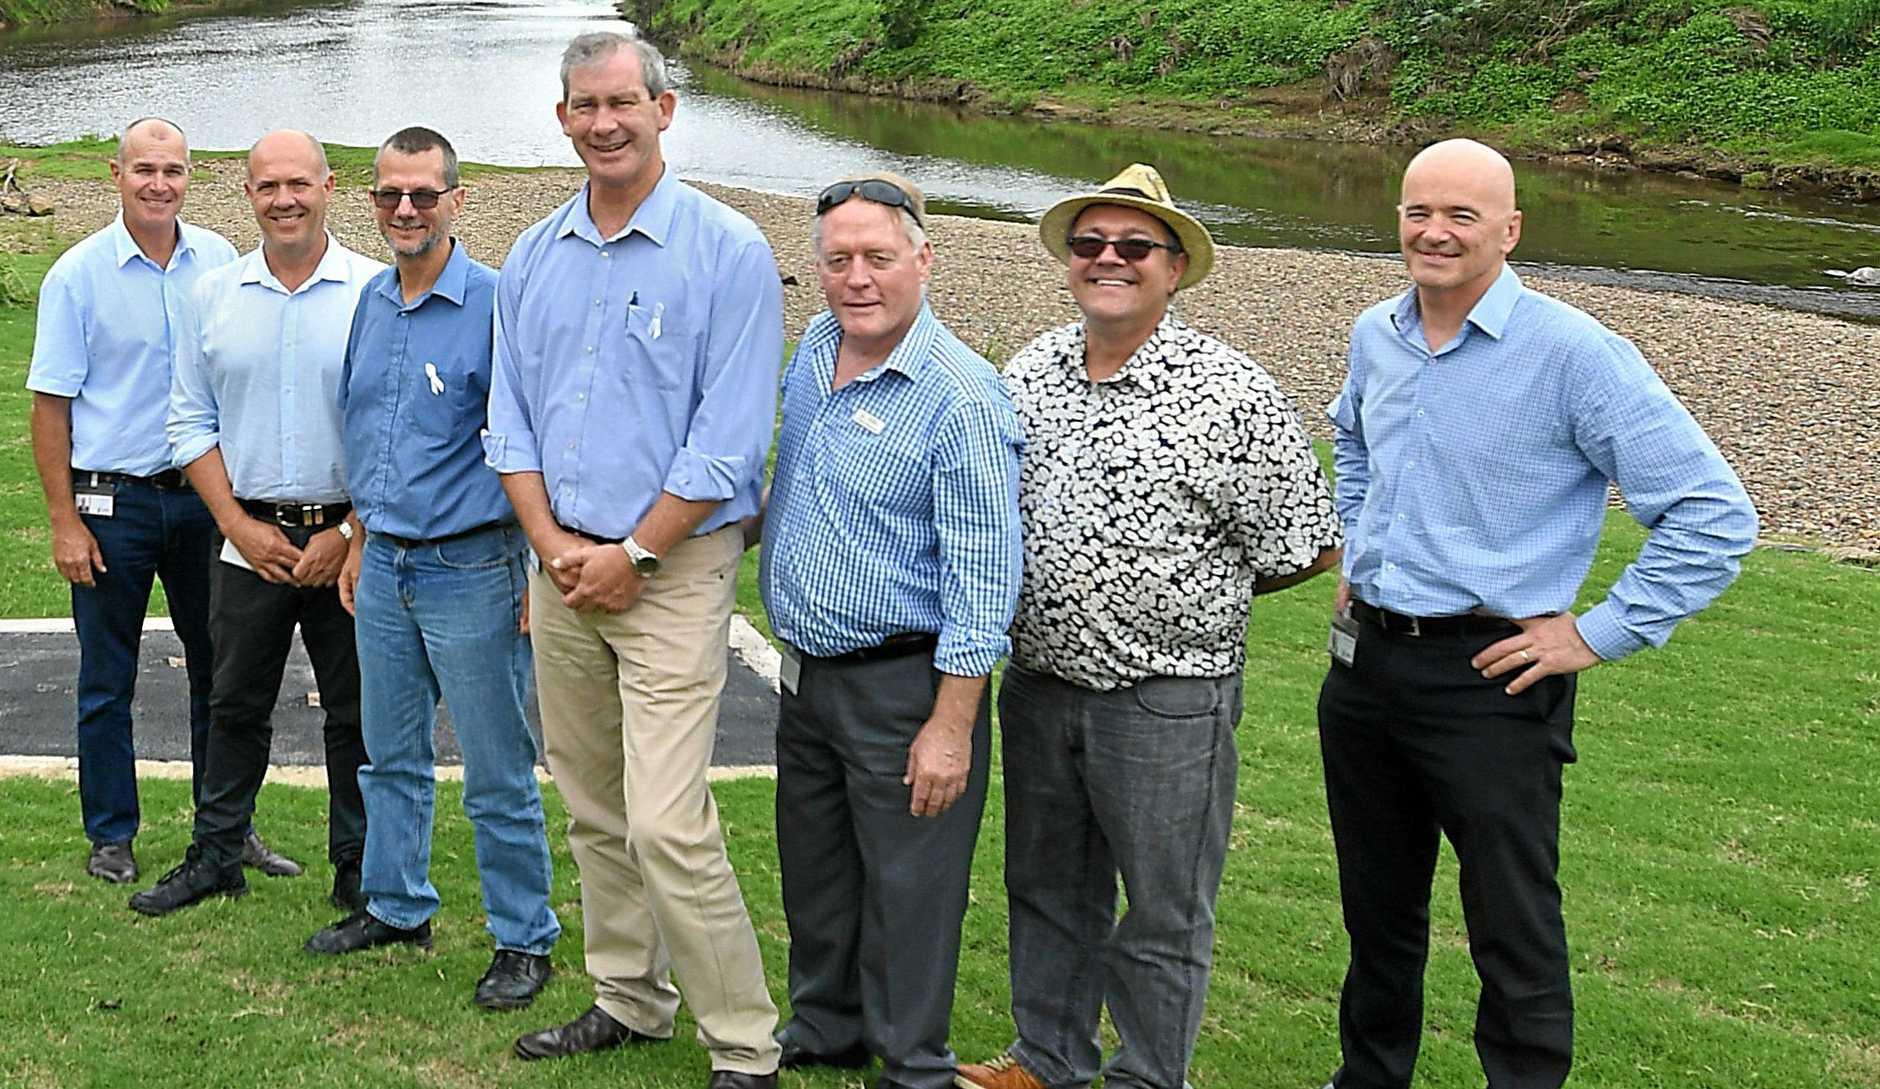 TEAM CURRAN: Bob Leitch, Mal Gear, Dan Stewart, Mick Curran Mark McDonald, Daryl Dodt and CEO Bernard Smith.